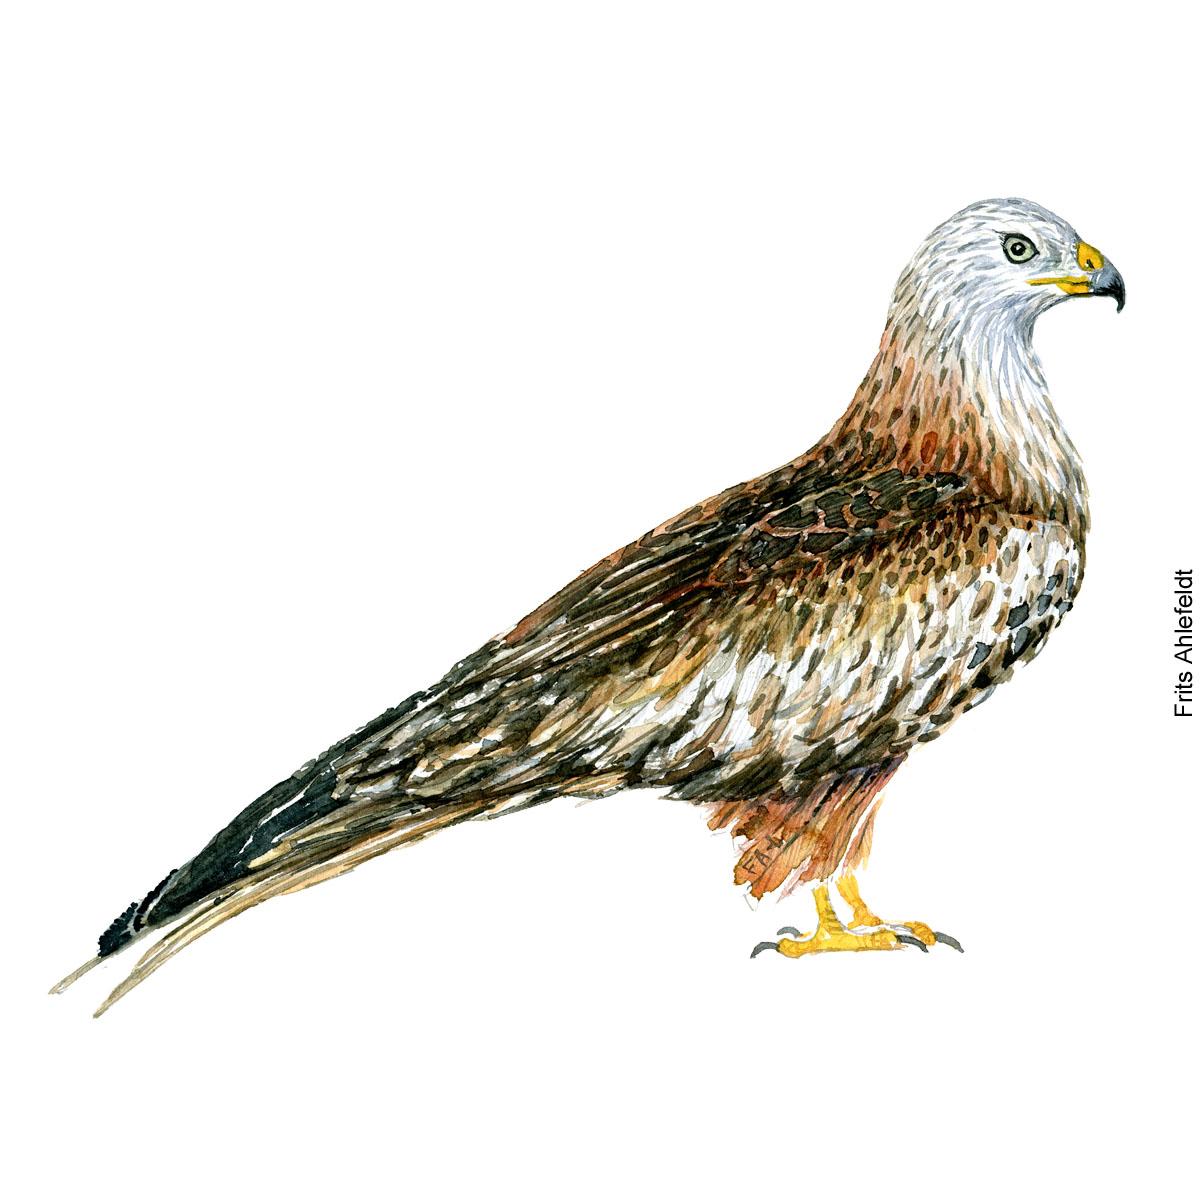 Roed glente - Red kite bird watercolor painting. Artwork by Frits Ahlefeldt. Fugle akvarel